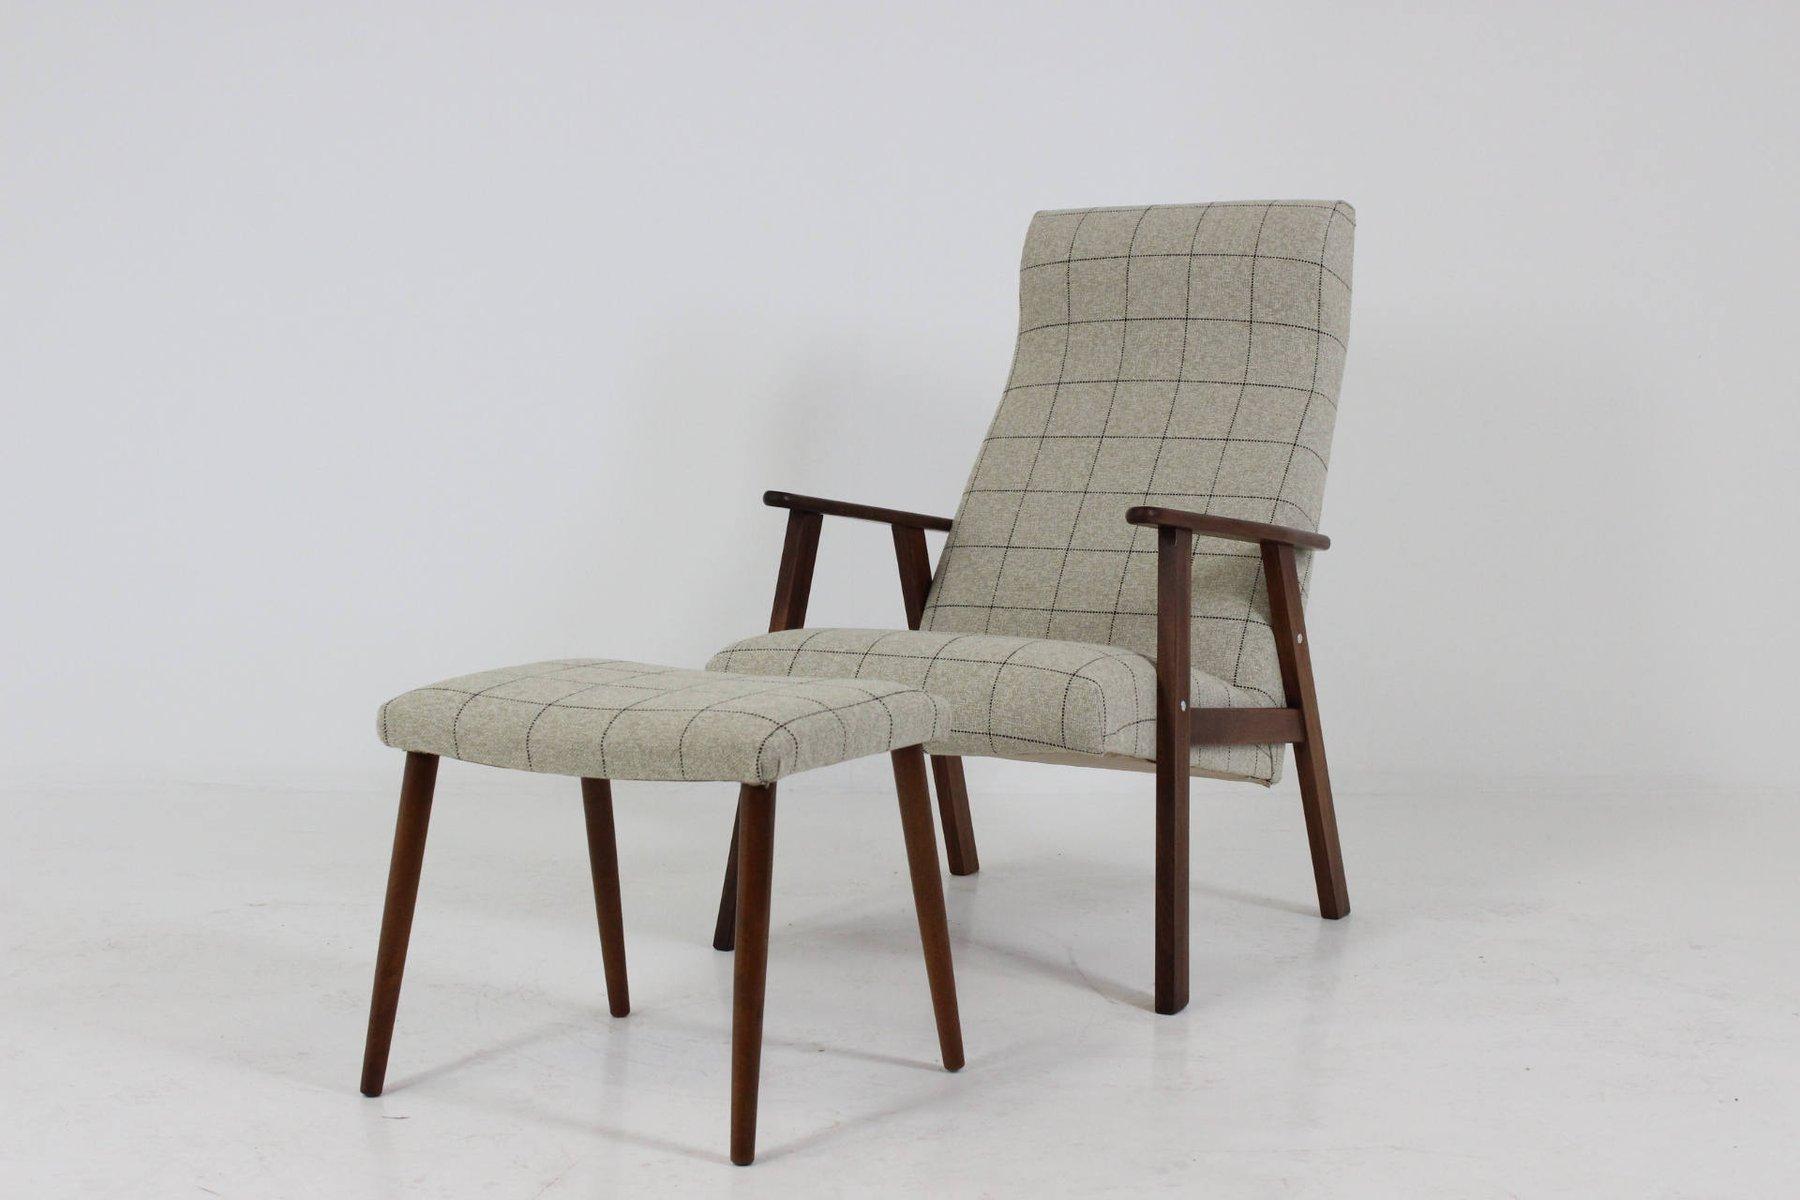 Danish Teak Highback Easy Chair with Stool 1960s & Danish Teak Highback Easy Chair with Stool 1960s for sale at Pamono islam-shia.org